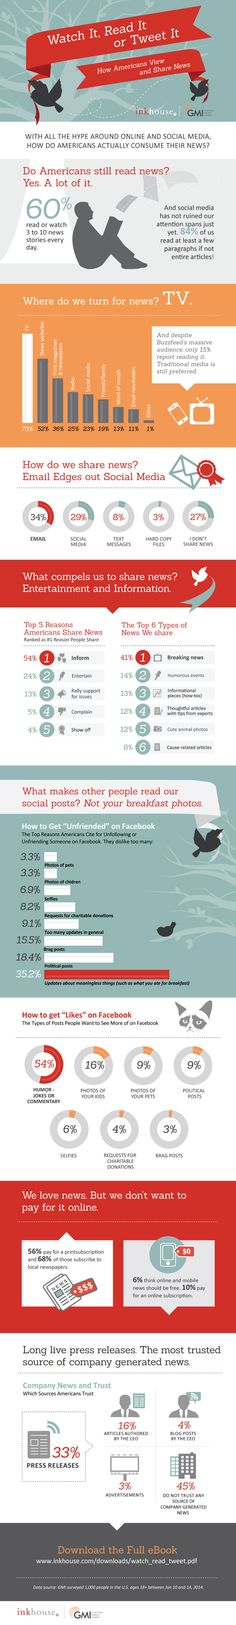 How Americans view and share the news on social media. #socialmedia #usa #media #news